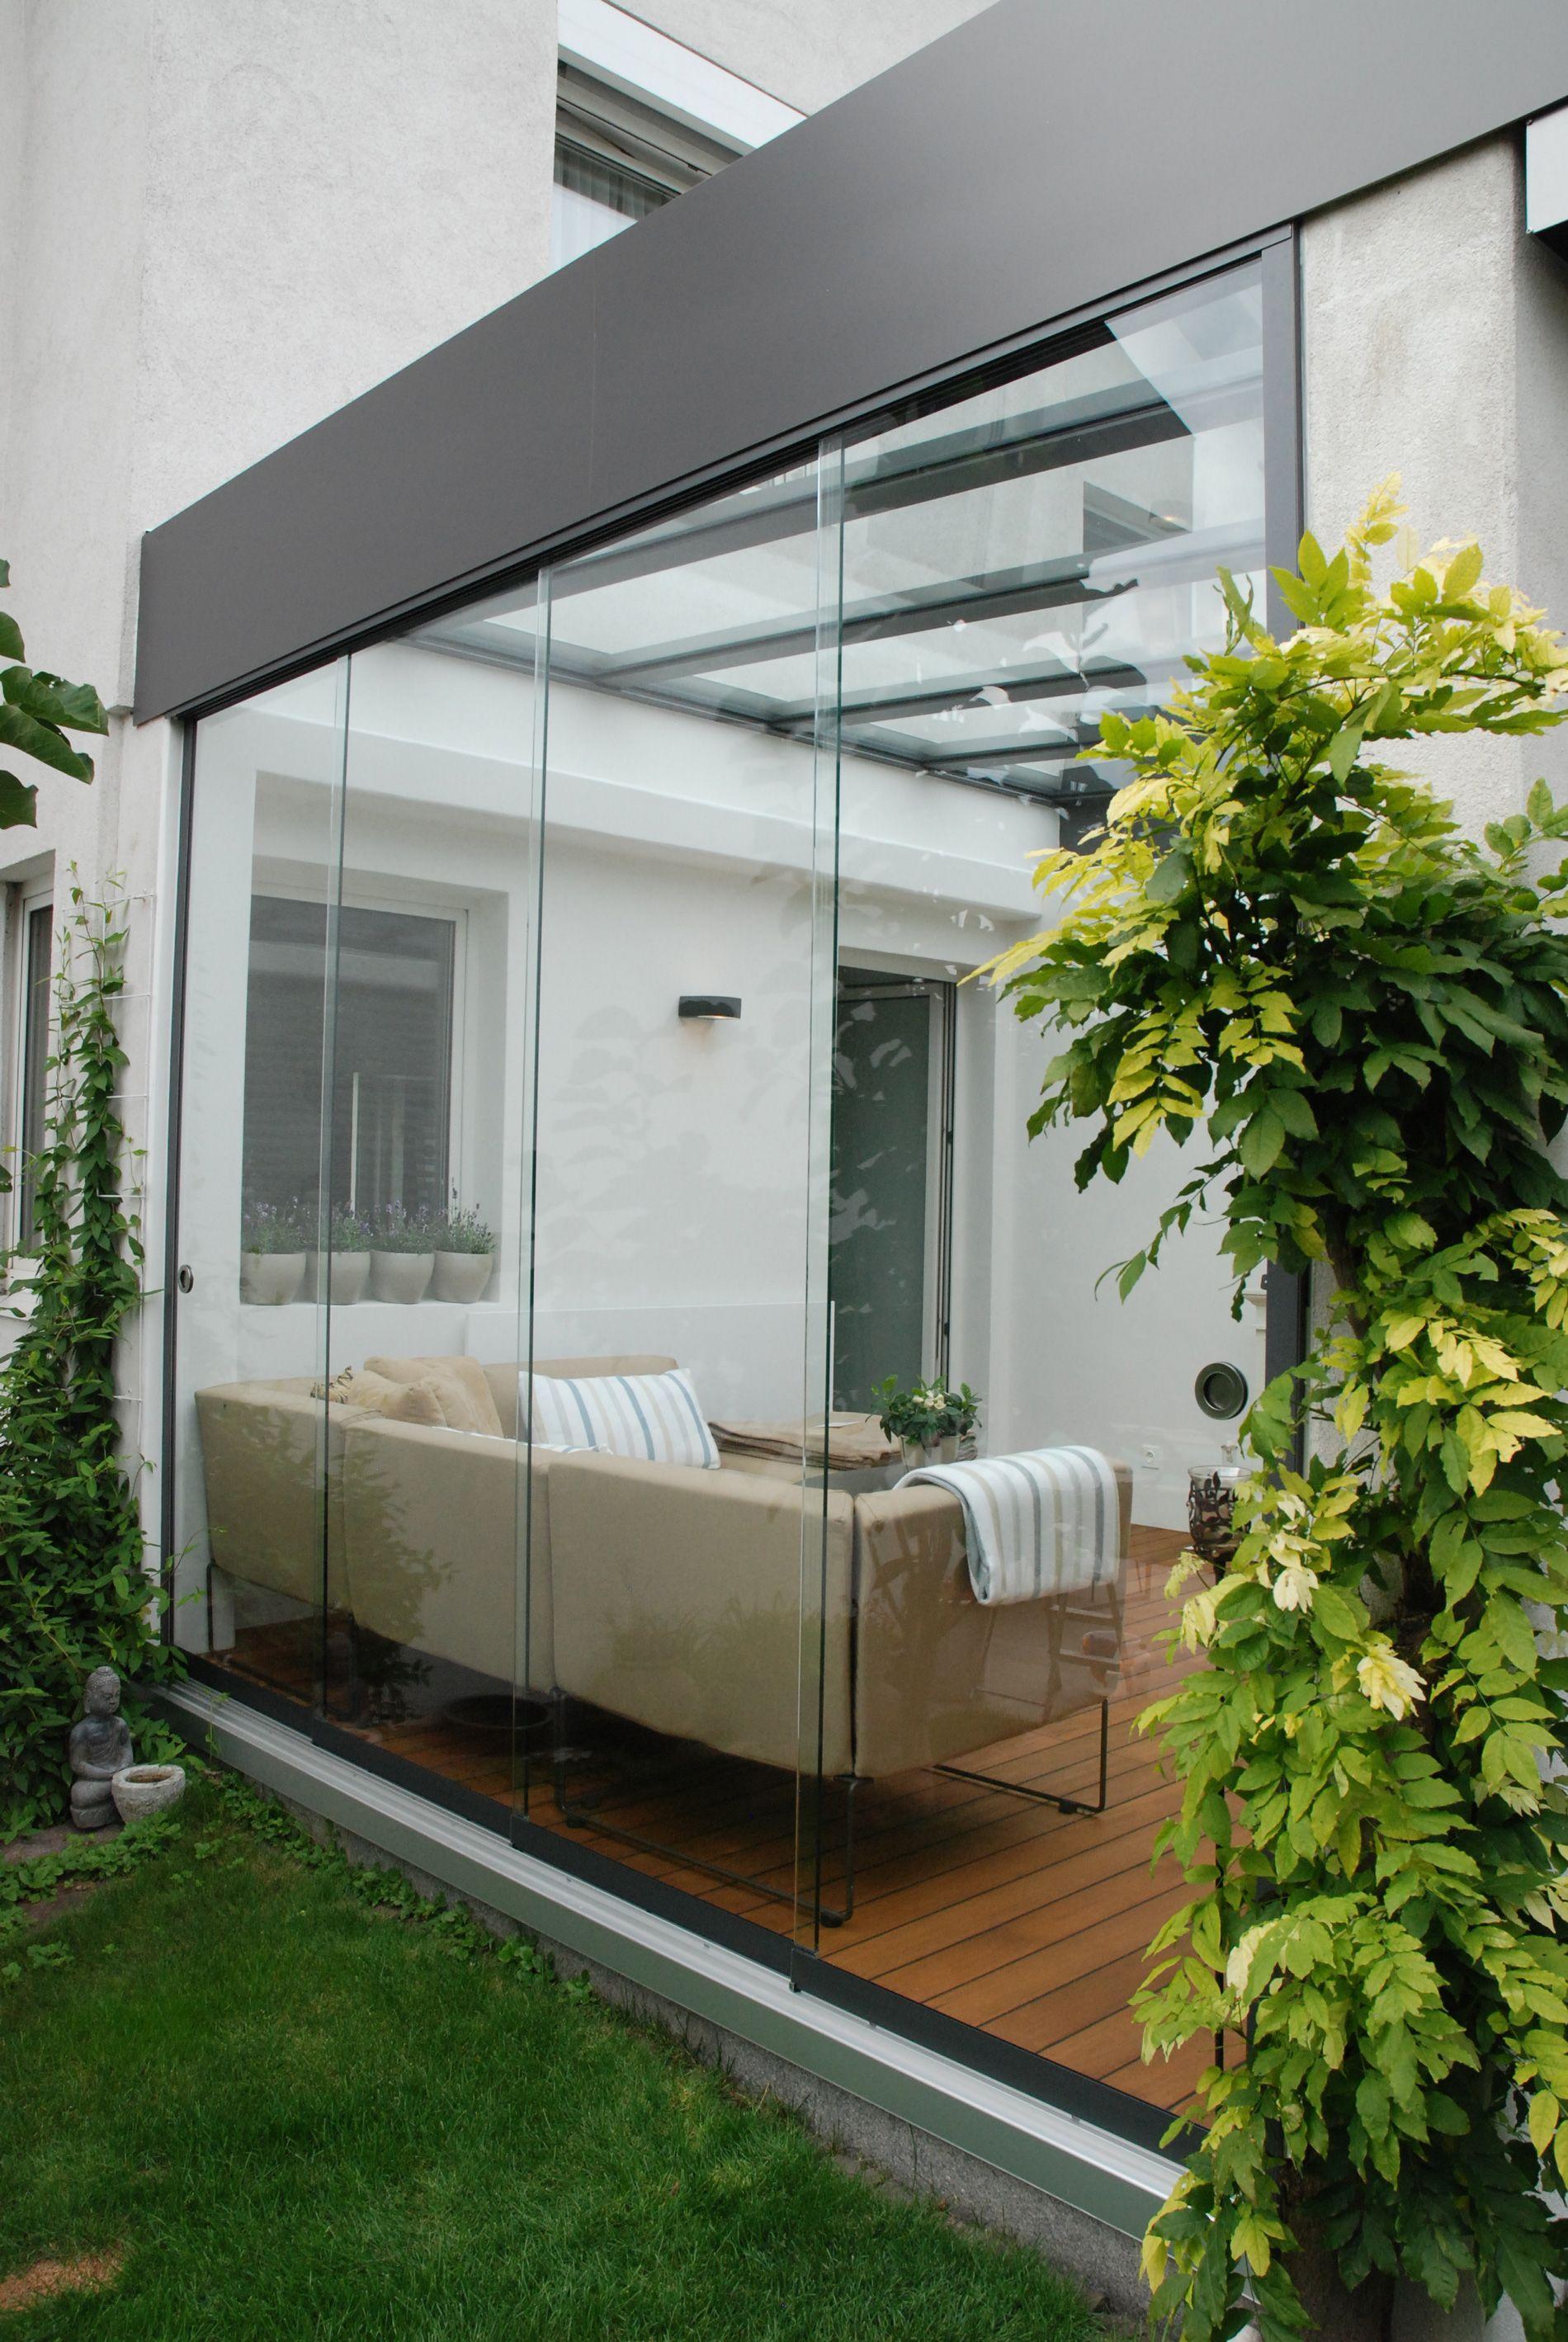 Schiebetursysteme Fur Wintergarten Terrazza Con Giardino Terrazzo Arredamento